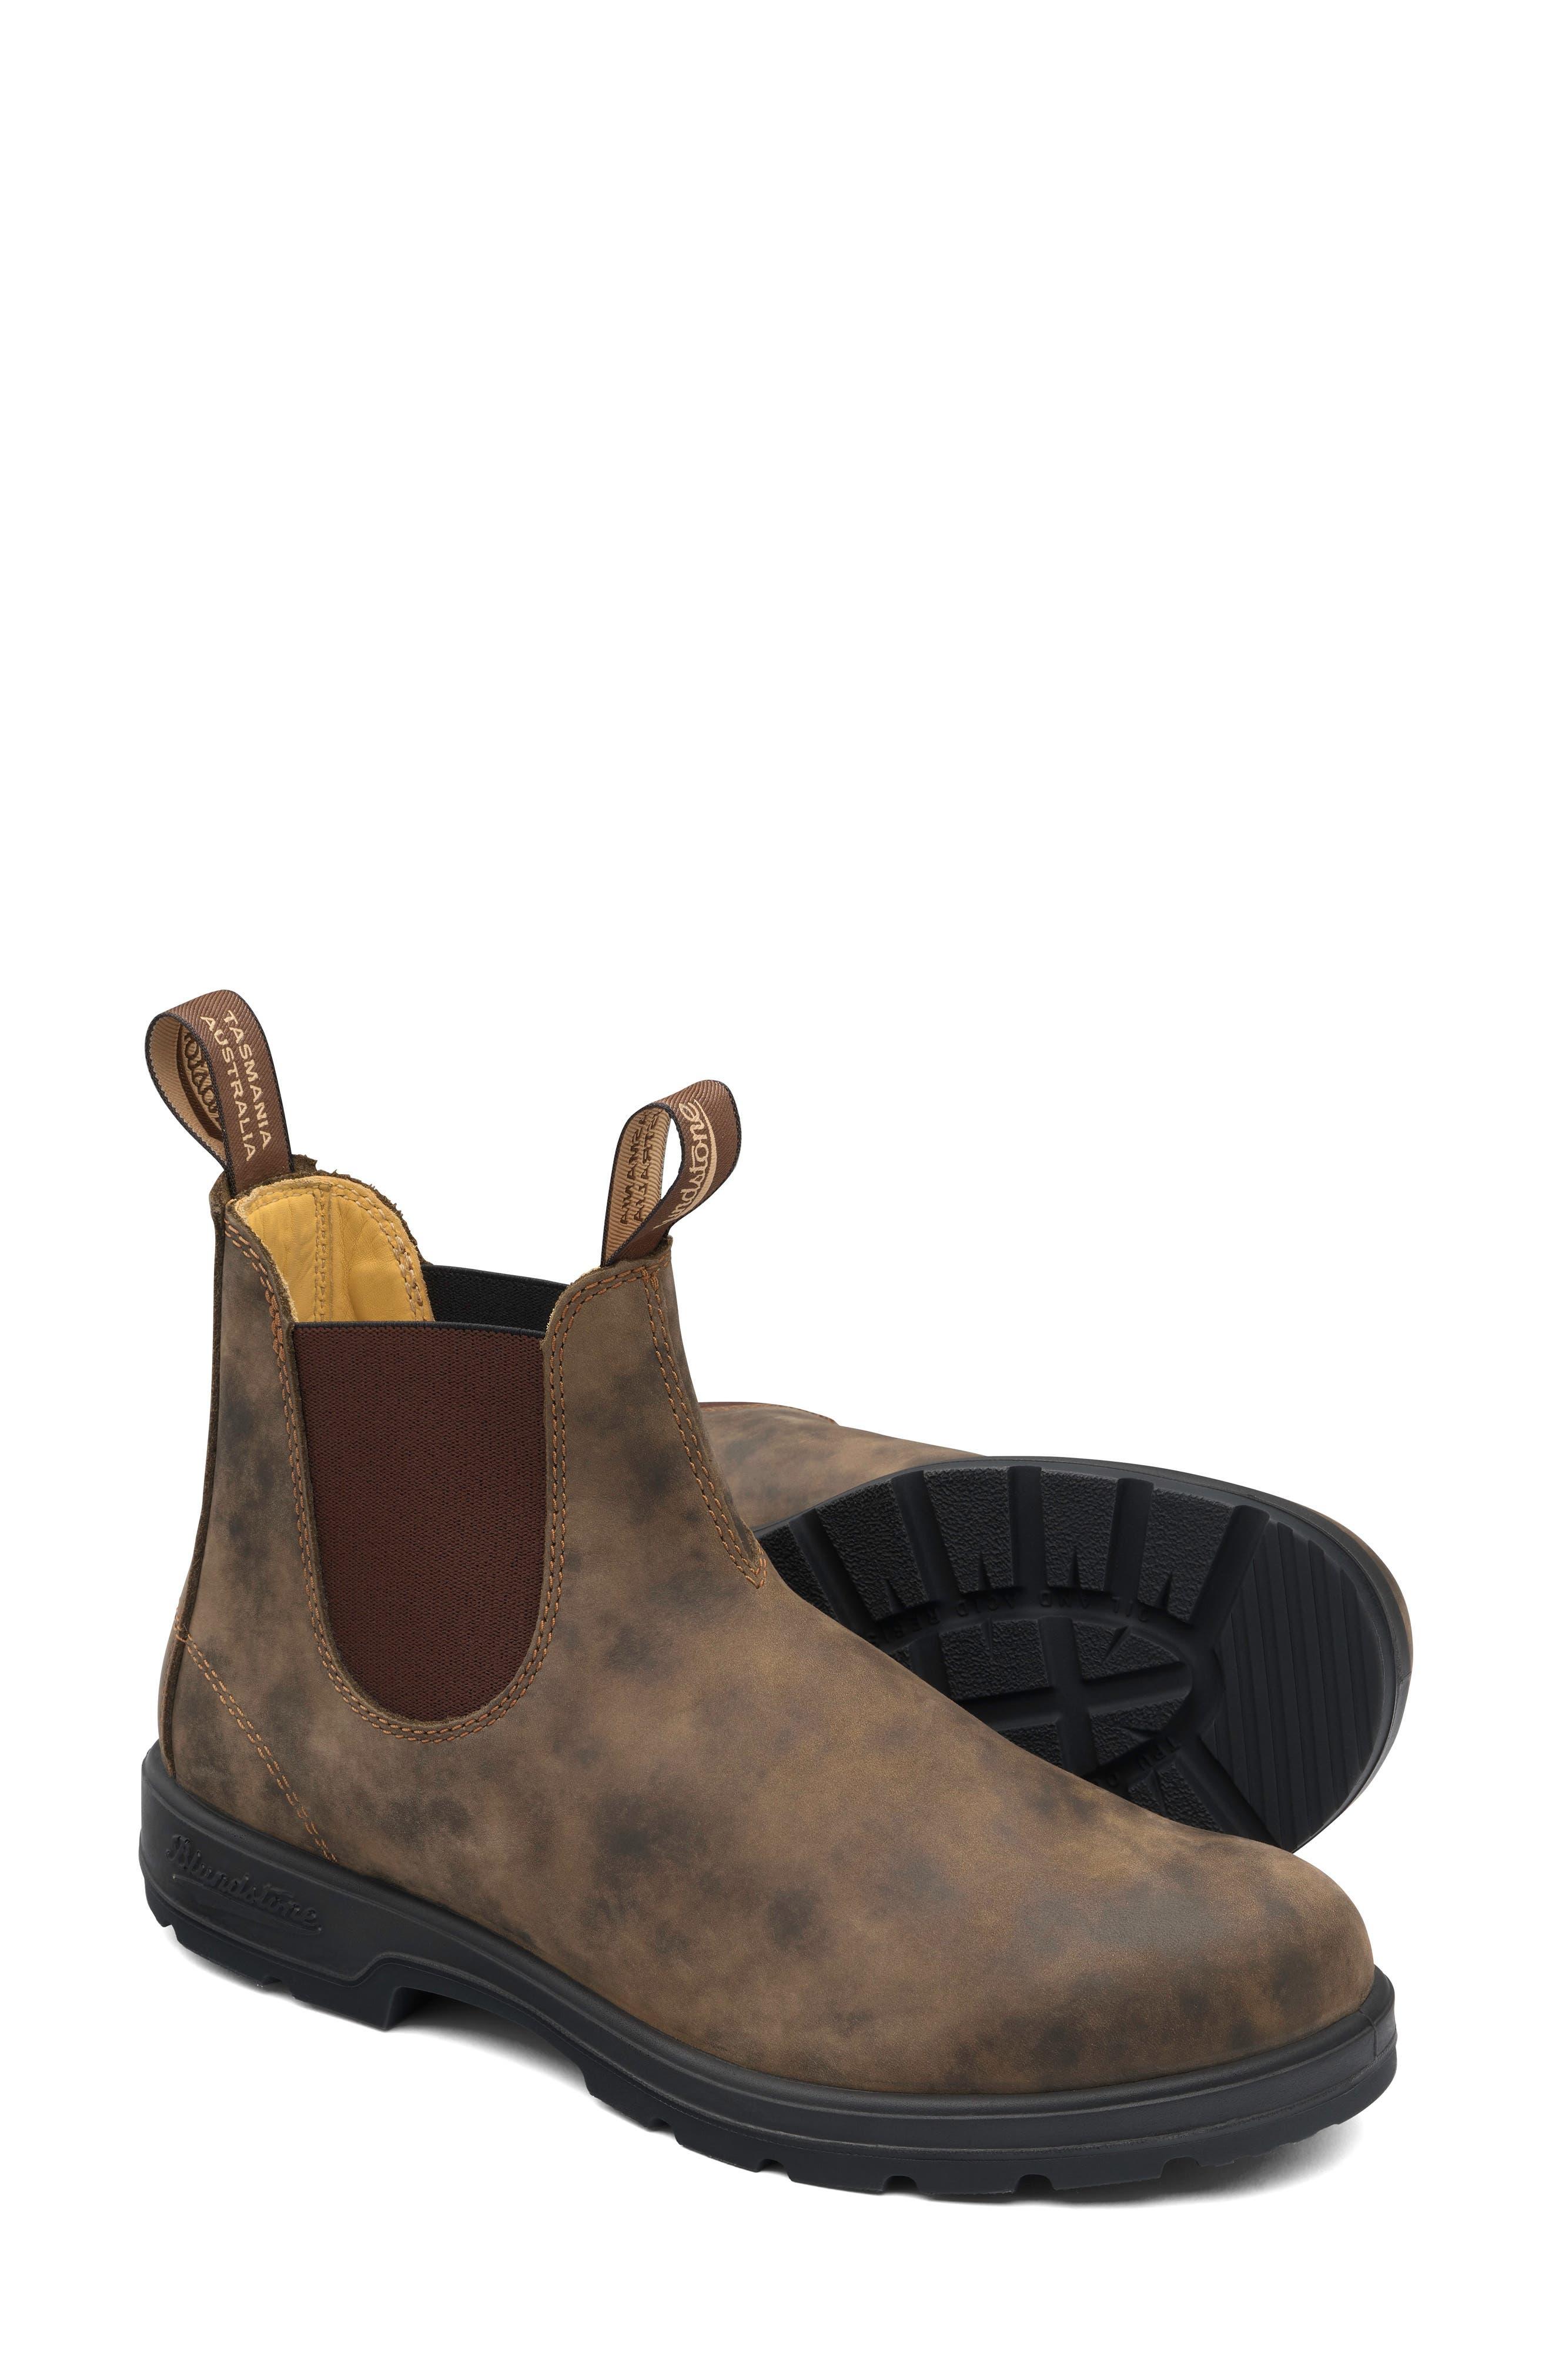 Men's Blundstone Classic 550 Series Water Resistant Chelsea Boot